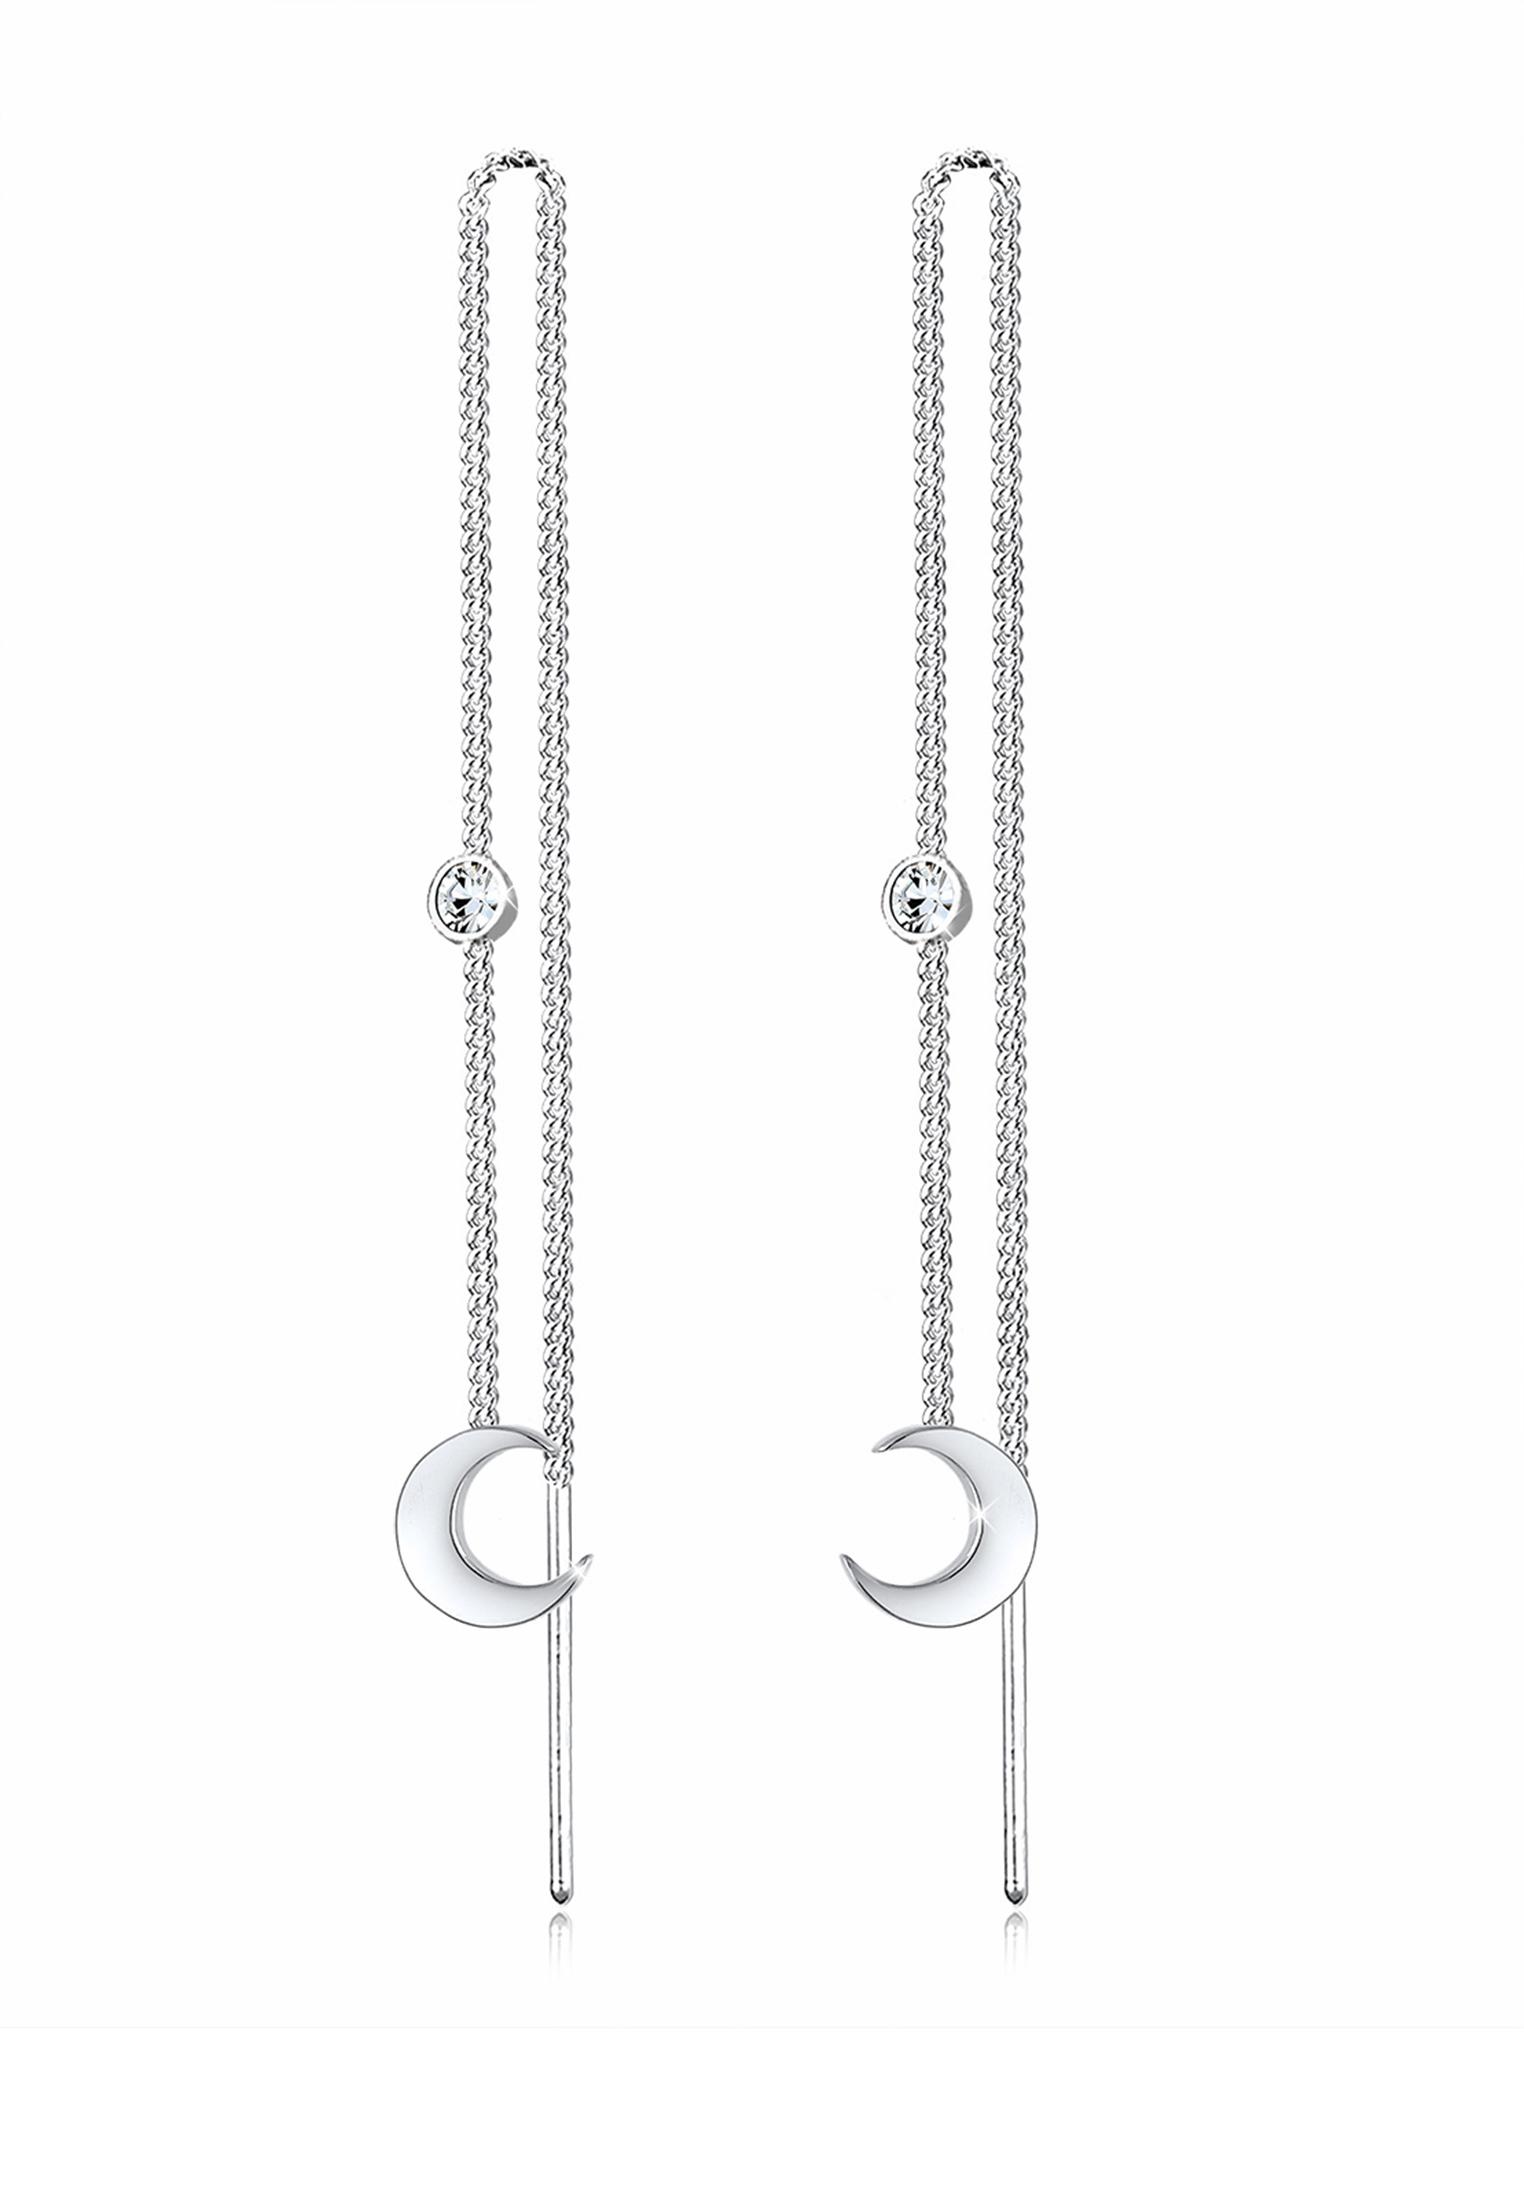 Ohrhänger Astro   Kristall ( Weiß )   925er Sterling Silber